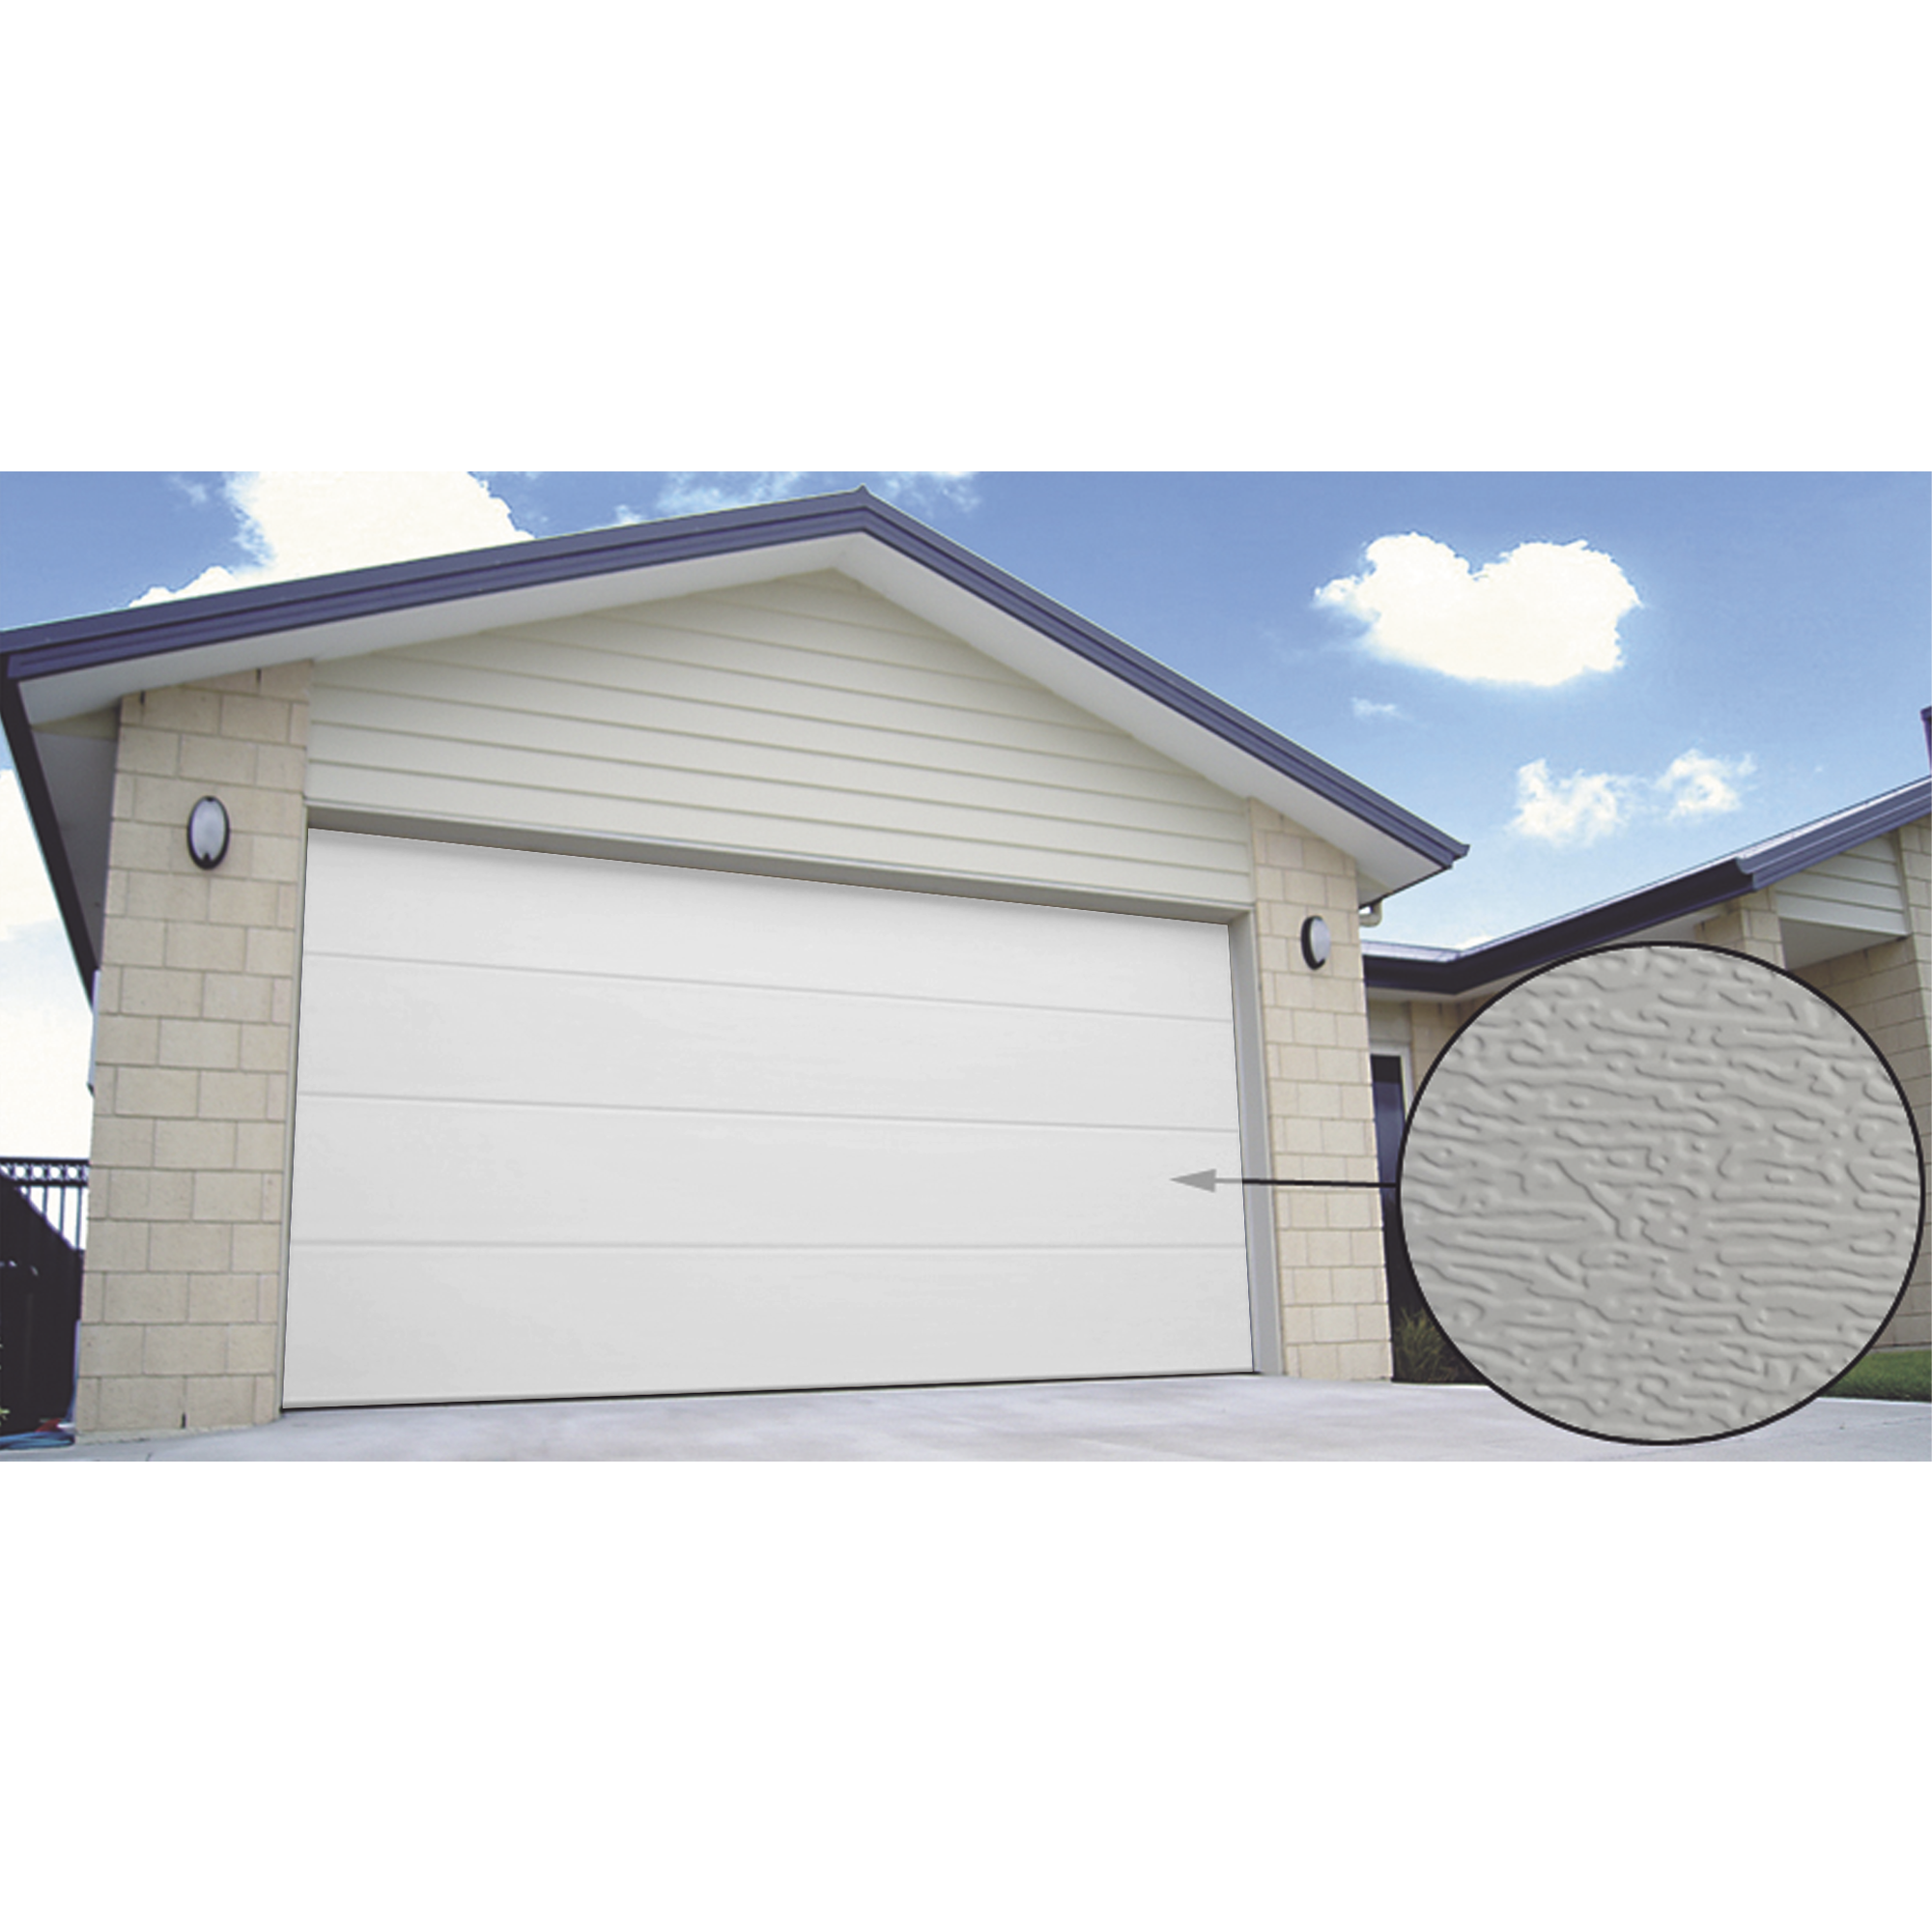 Puerta de Garage PREMIUM, Lisa color blanco 10X7 FT, AISLADA, Estilo U.S.A.